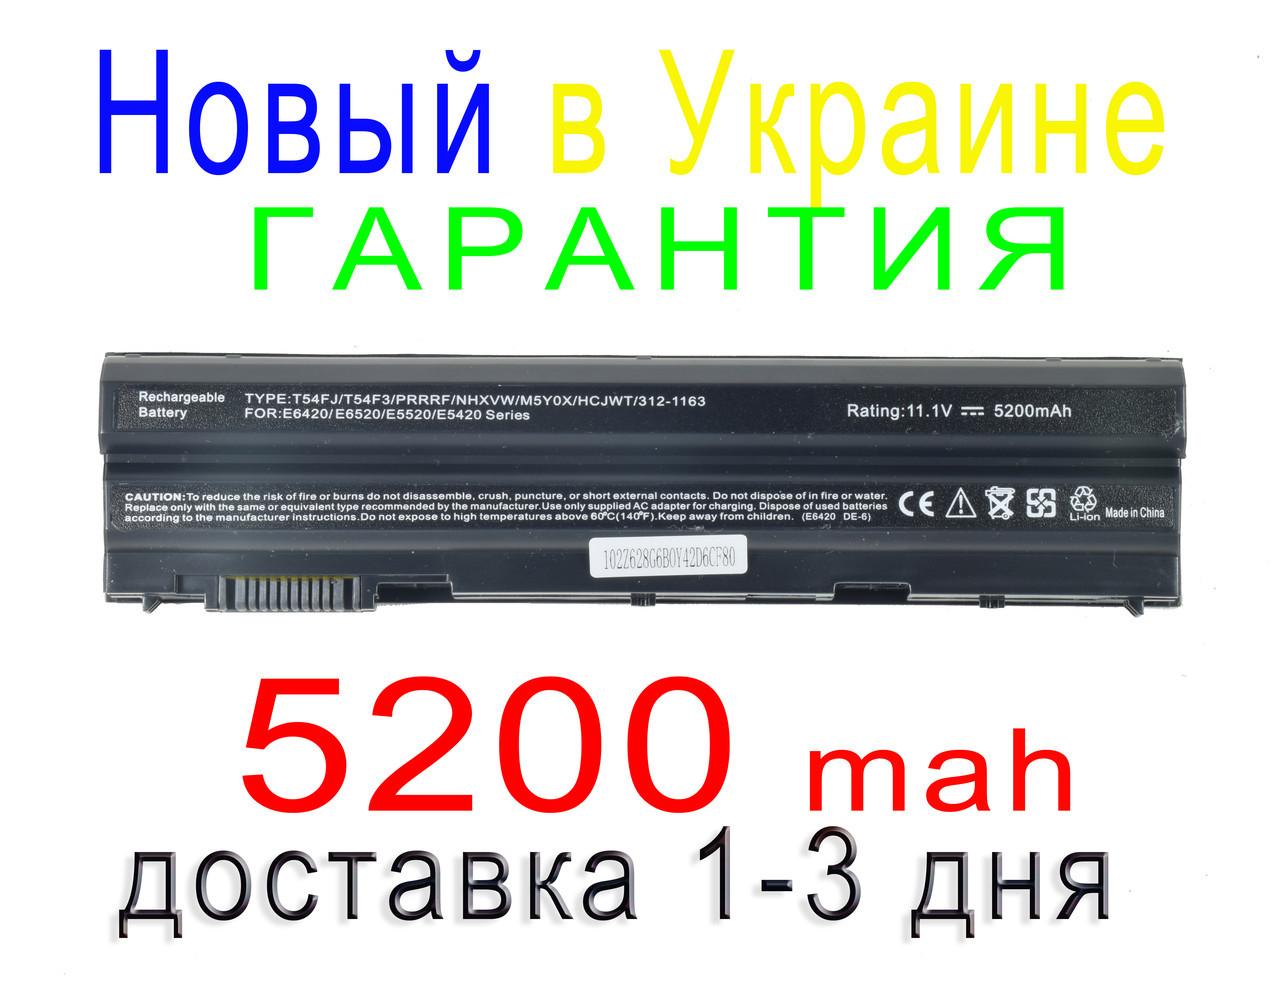 Аккумулятор батарея DELL 04NW9 05G67C 312-1163 312-1311 451-11694 8P3YX 911MD HCJWT